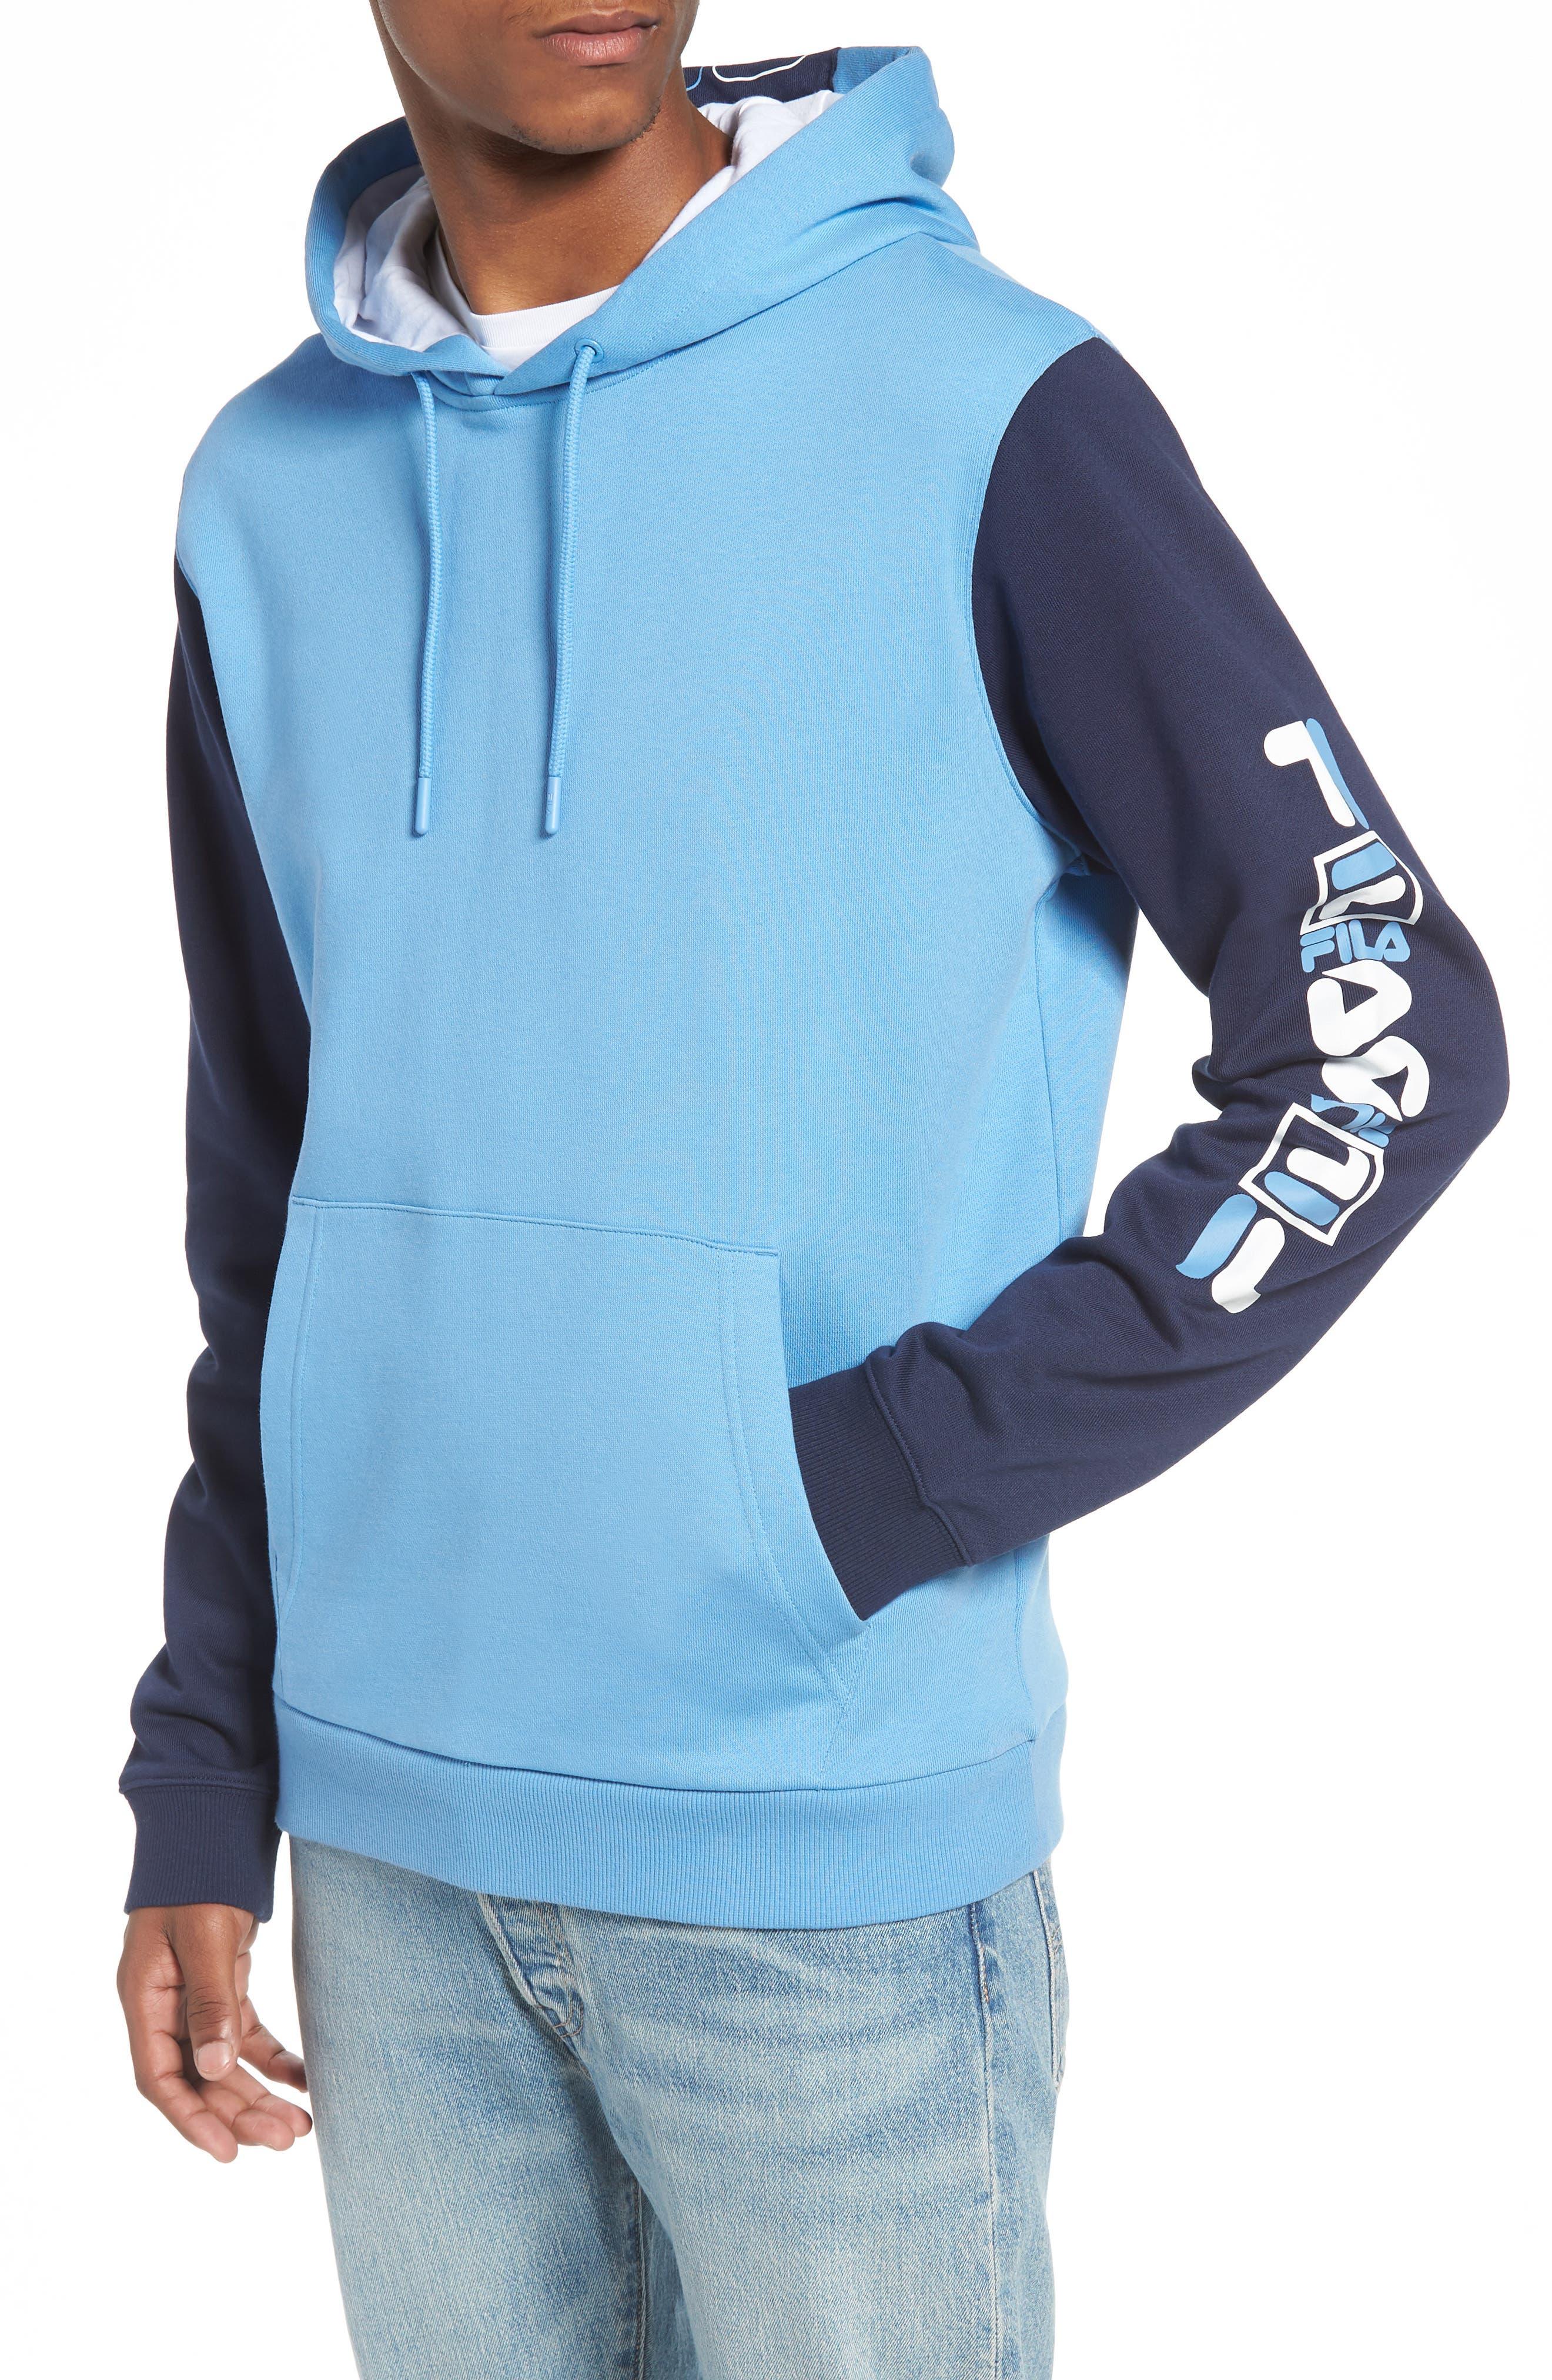 Jamison Hoodie,                         Main,                         color, BLUE/ PEACOAT/ WHITE